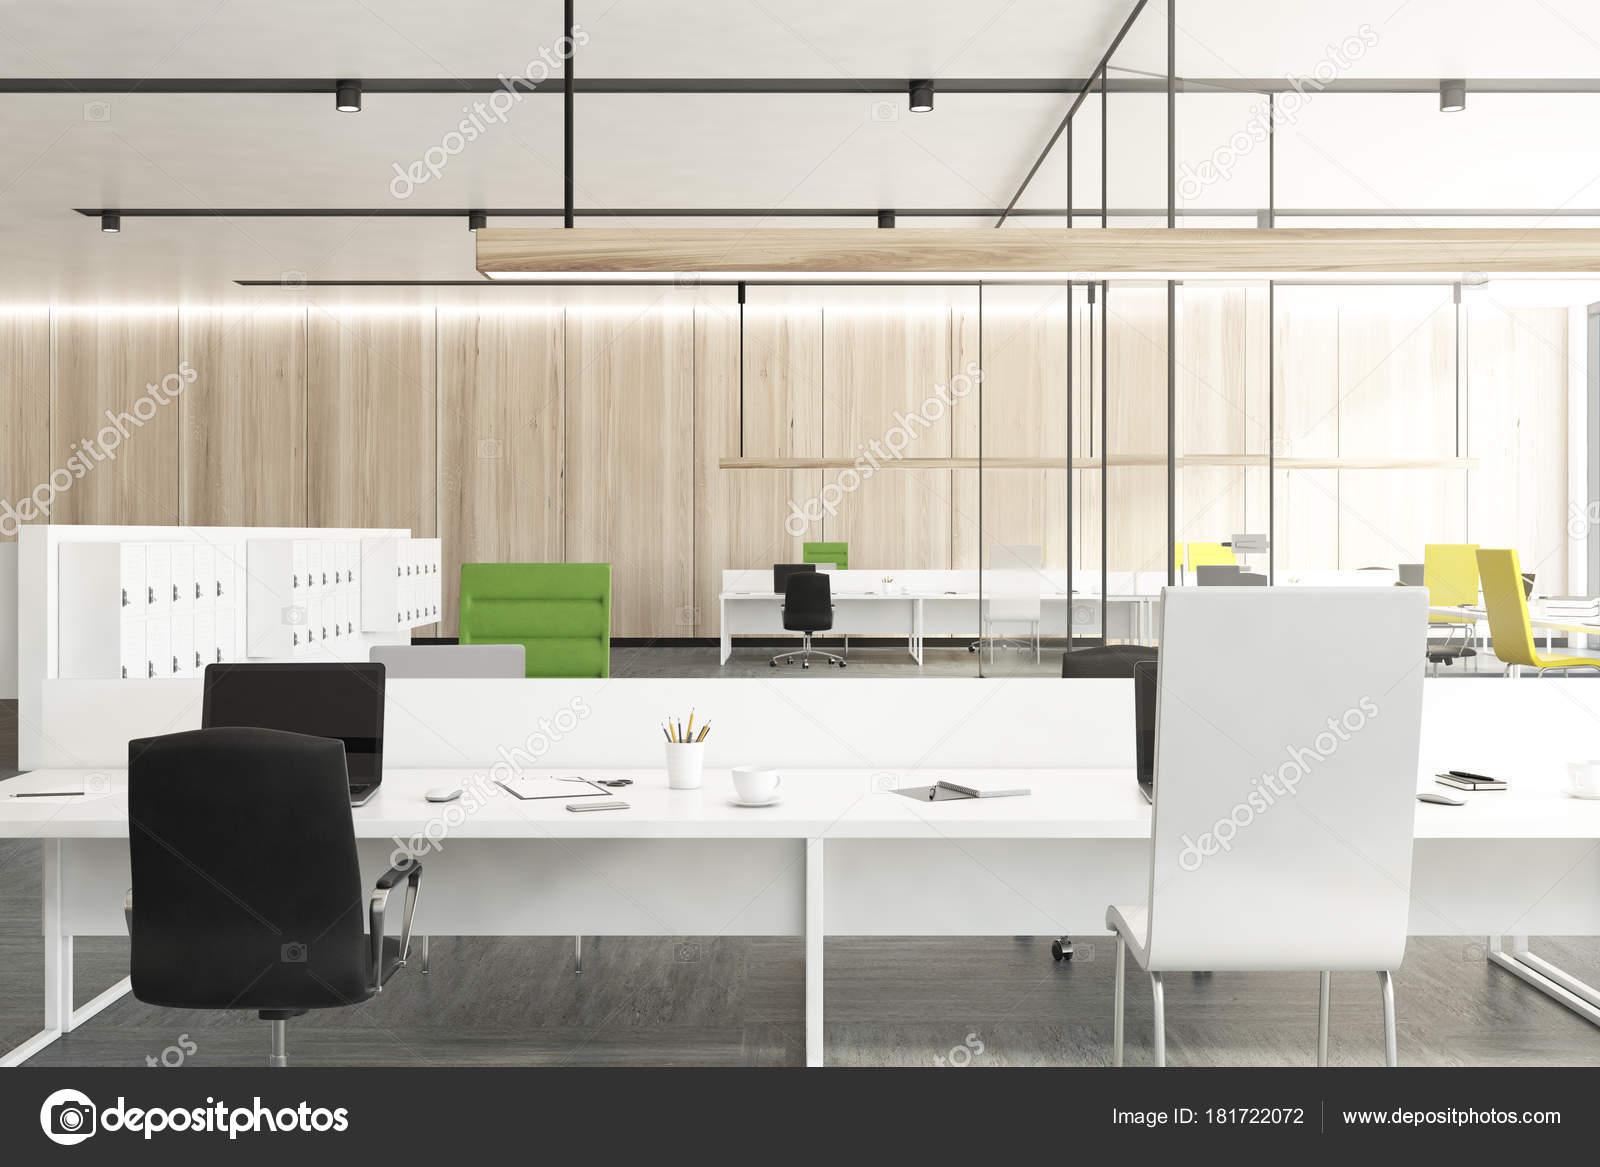 Hölzerne Büro mit Umkleide Schränke — Stockfoto © denisismagilov ...